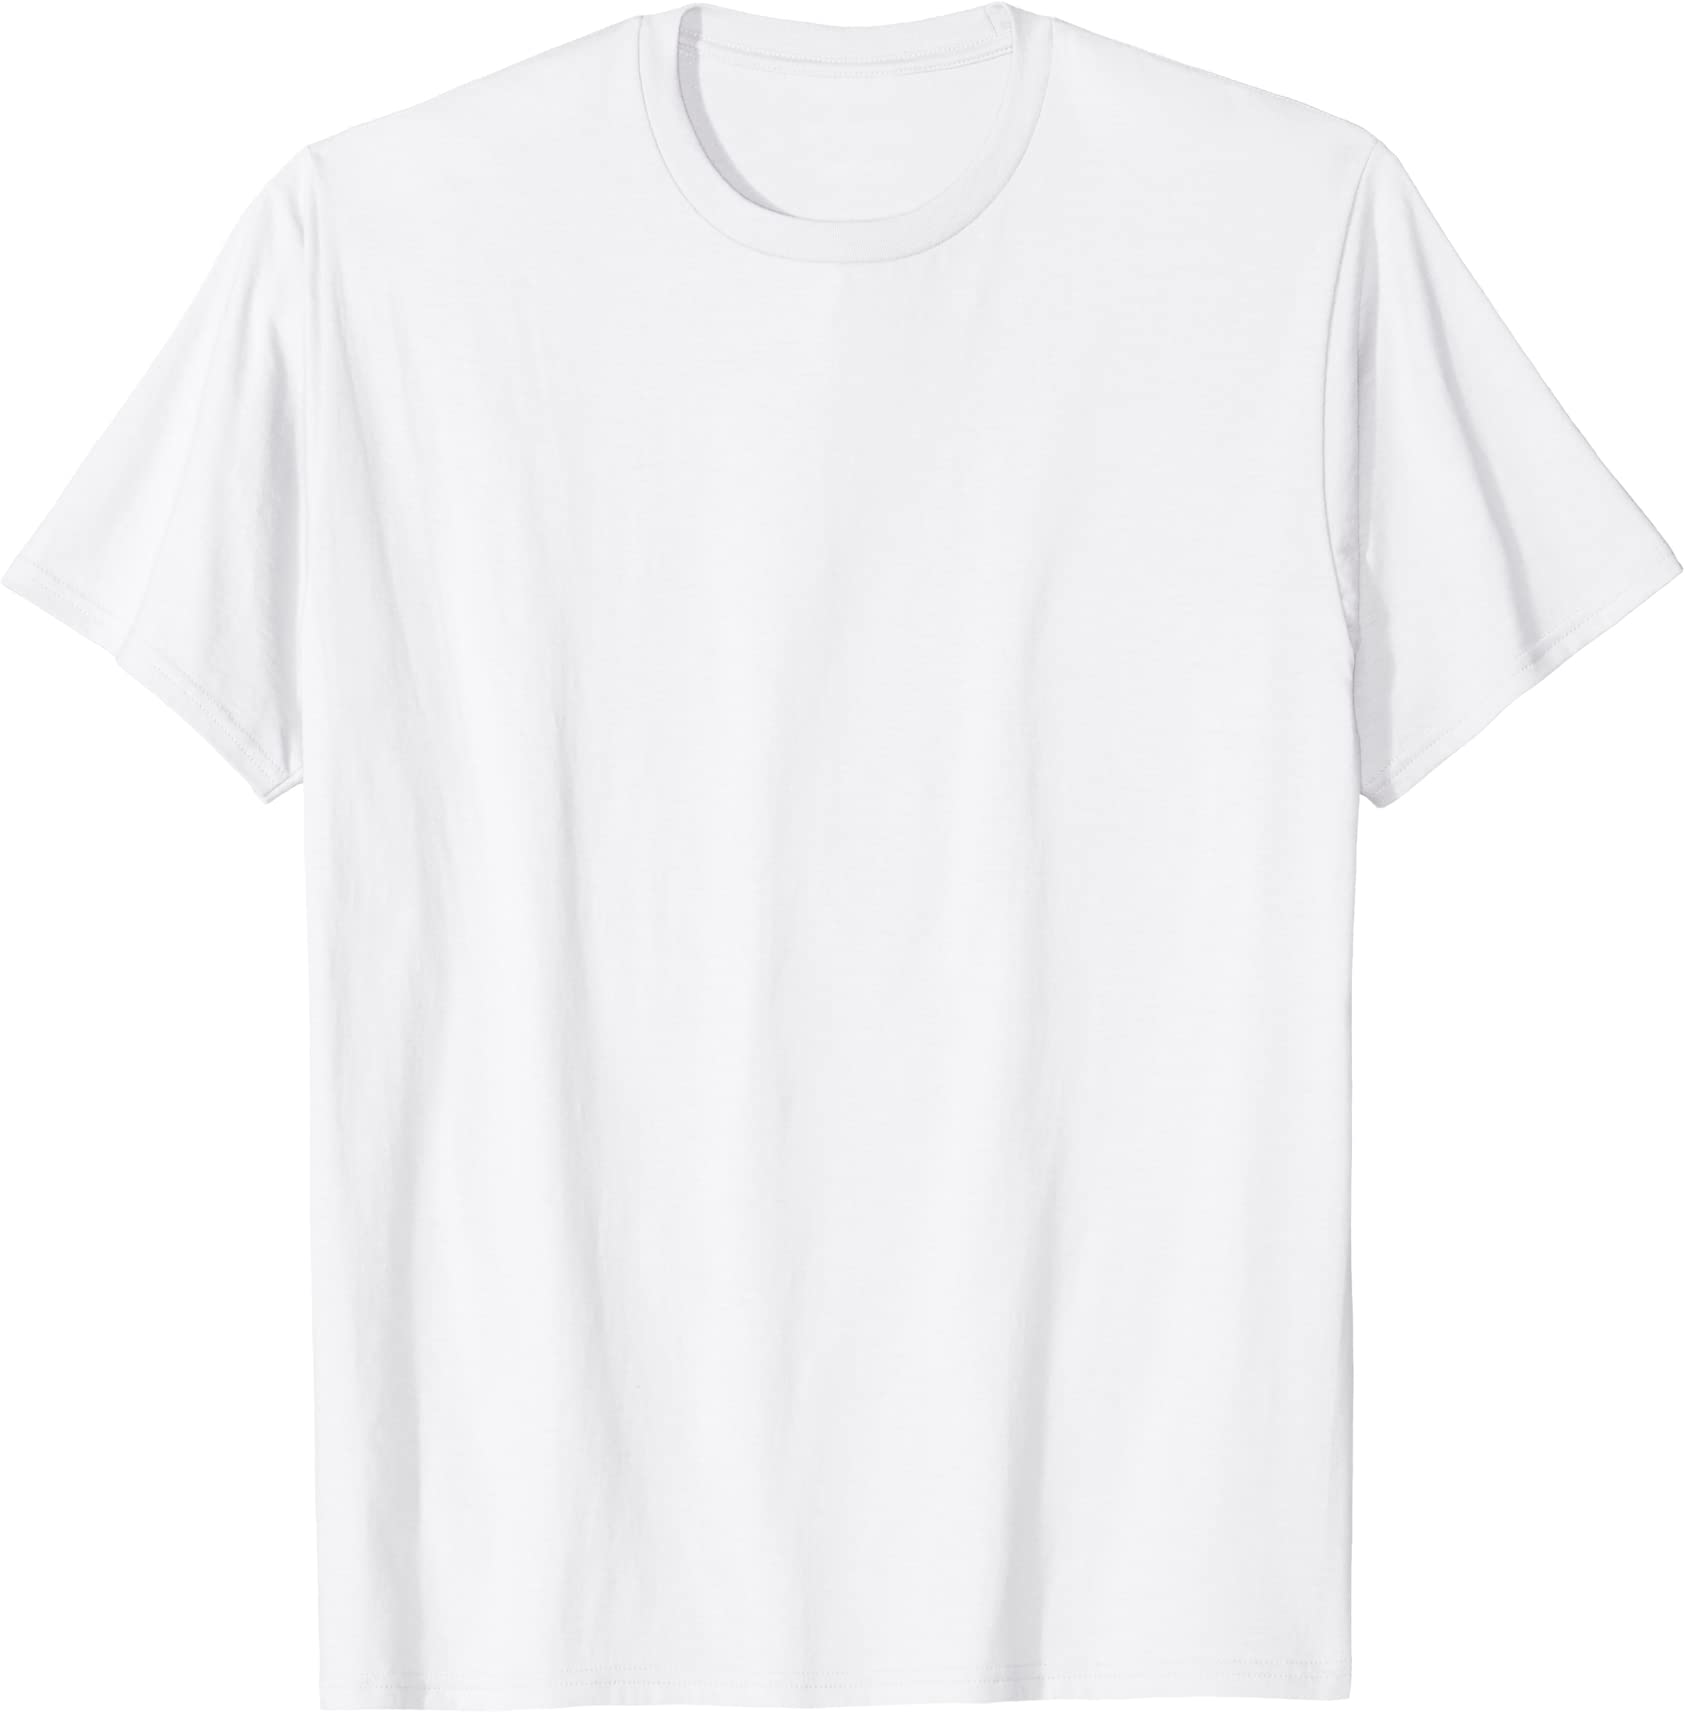 Duck Digitally Printed White Standard T-Shirt